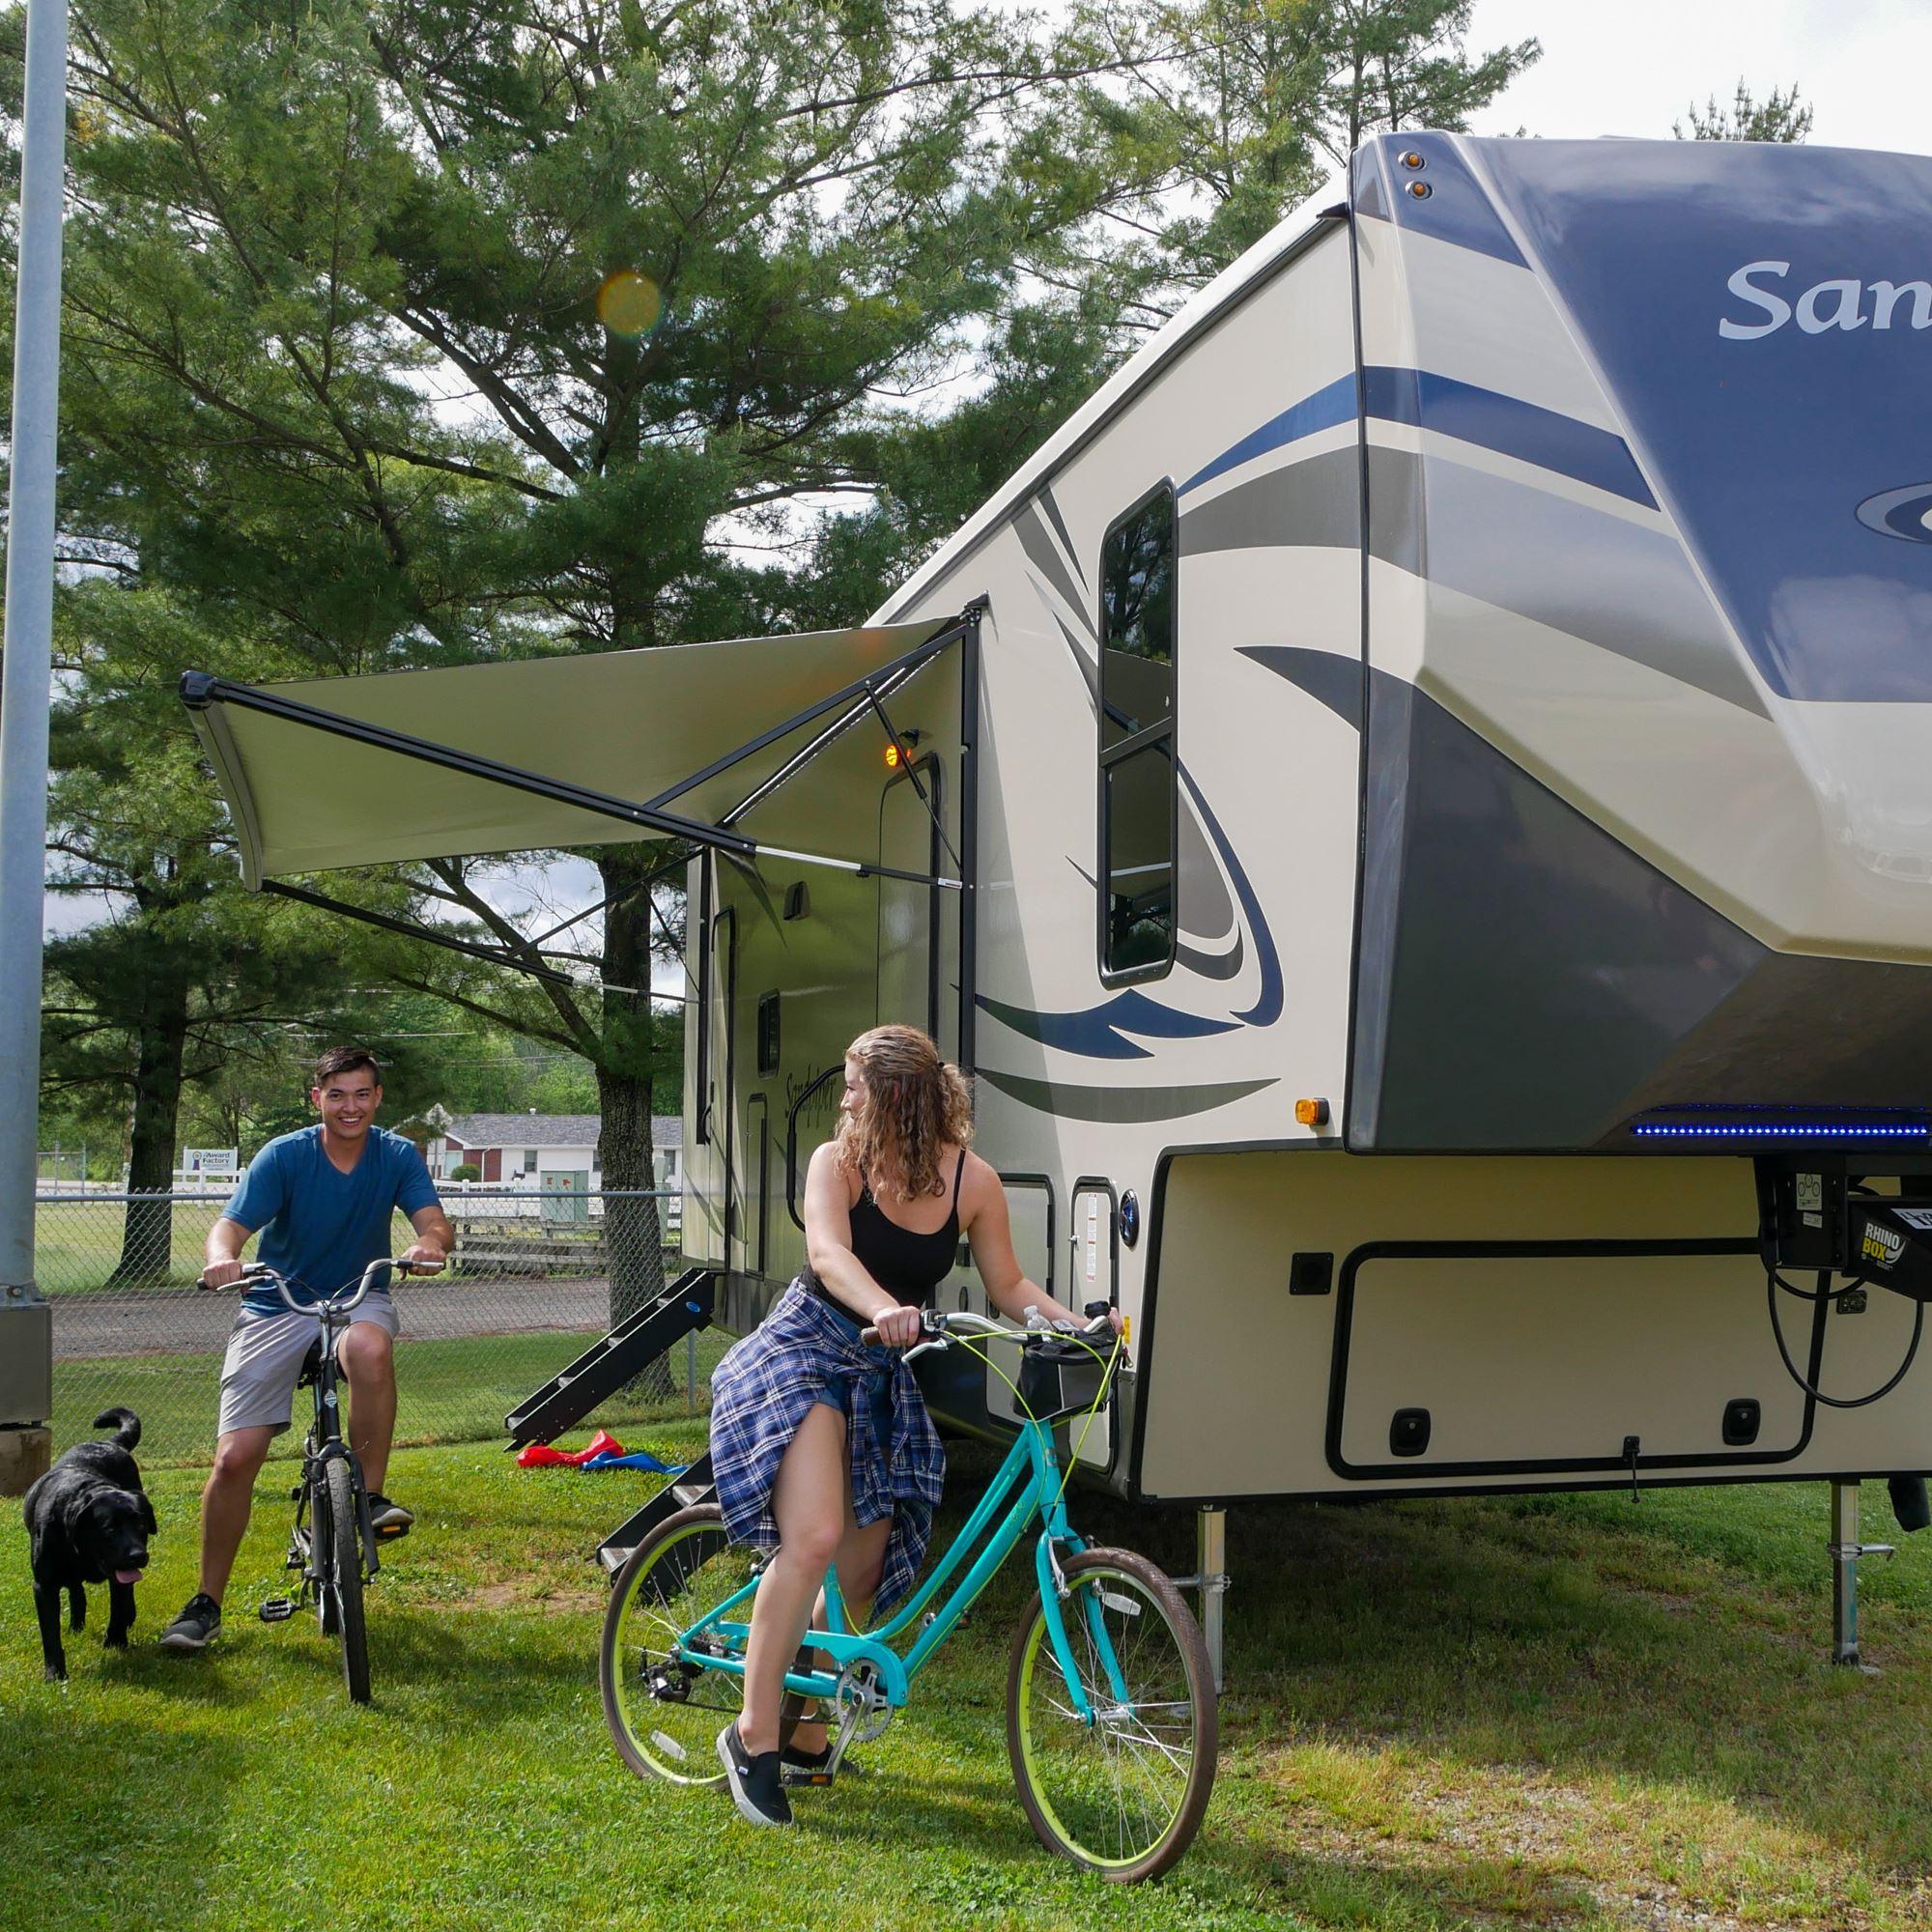 Public RV Camping